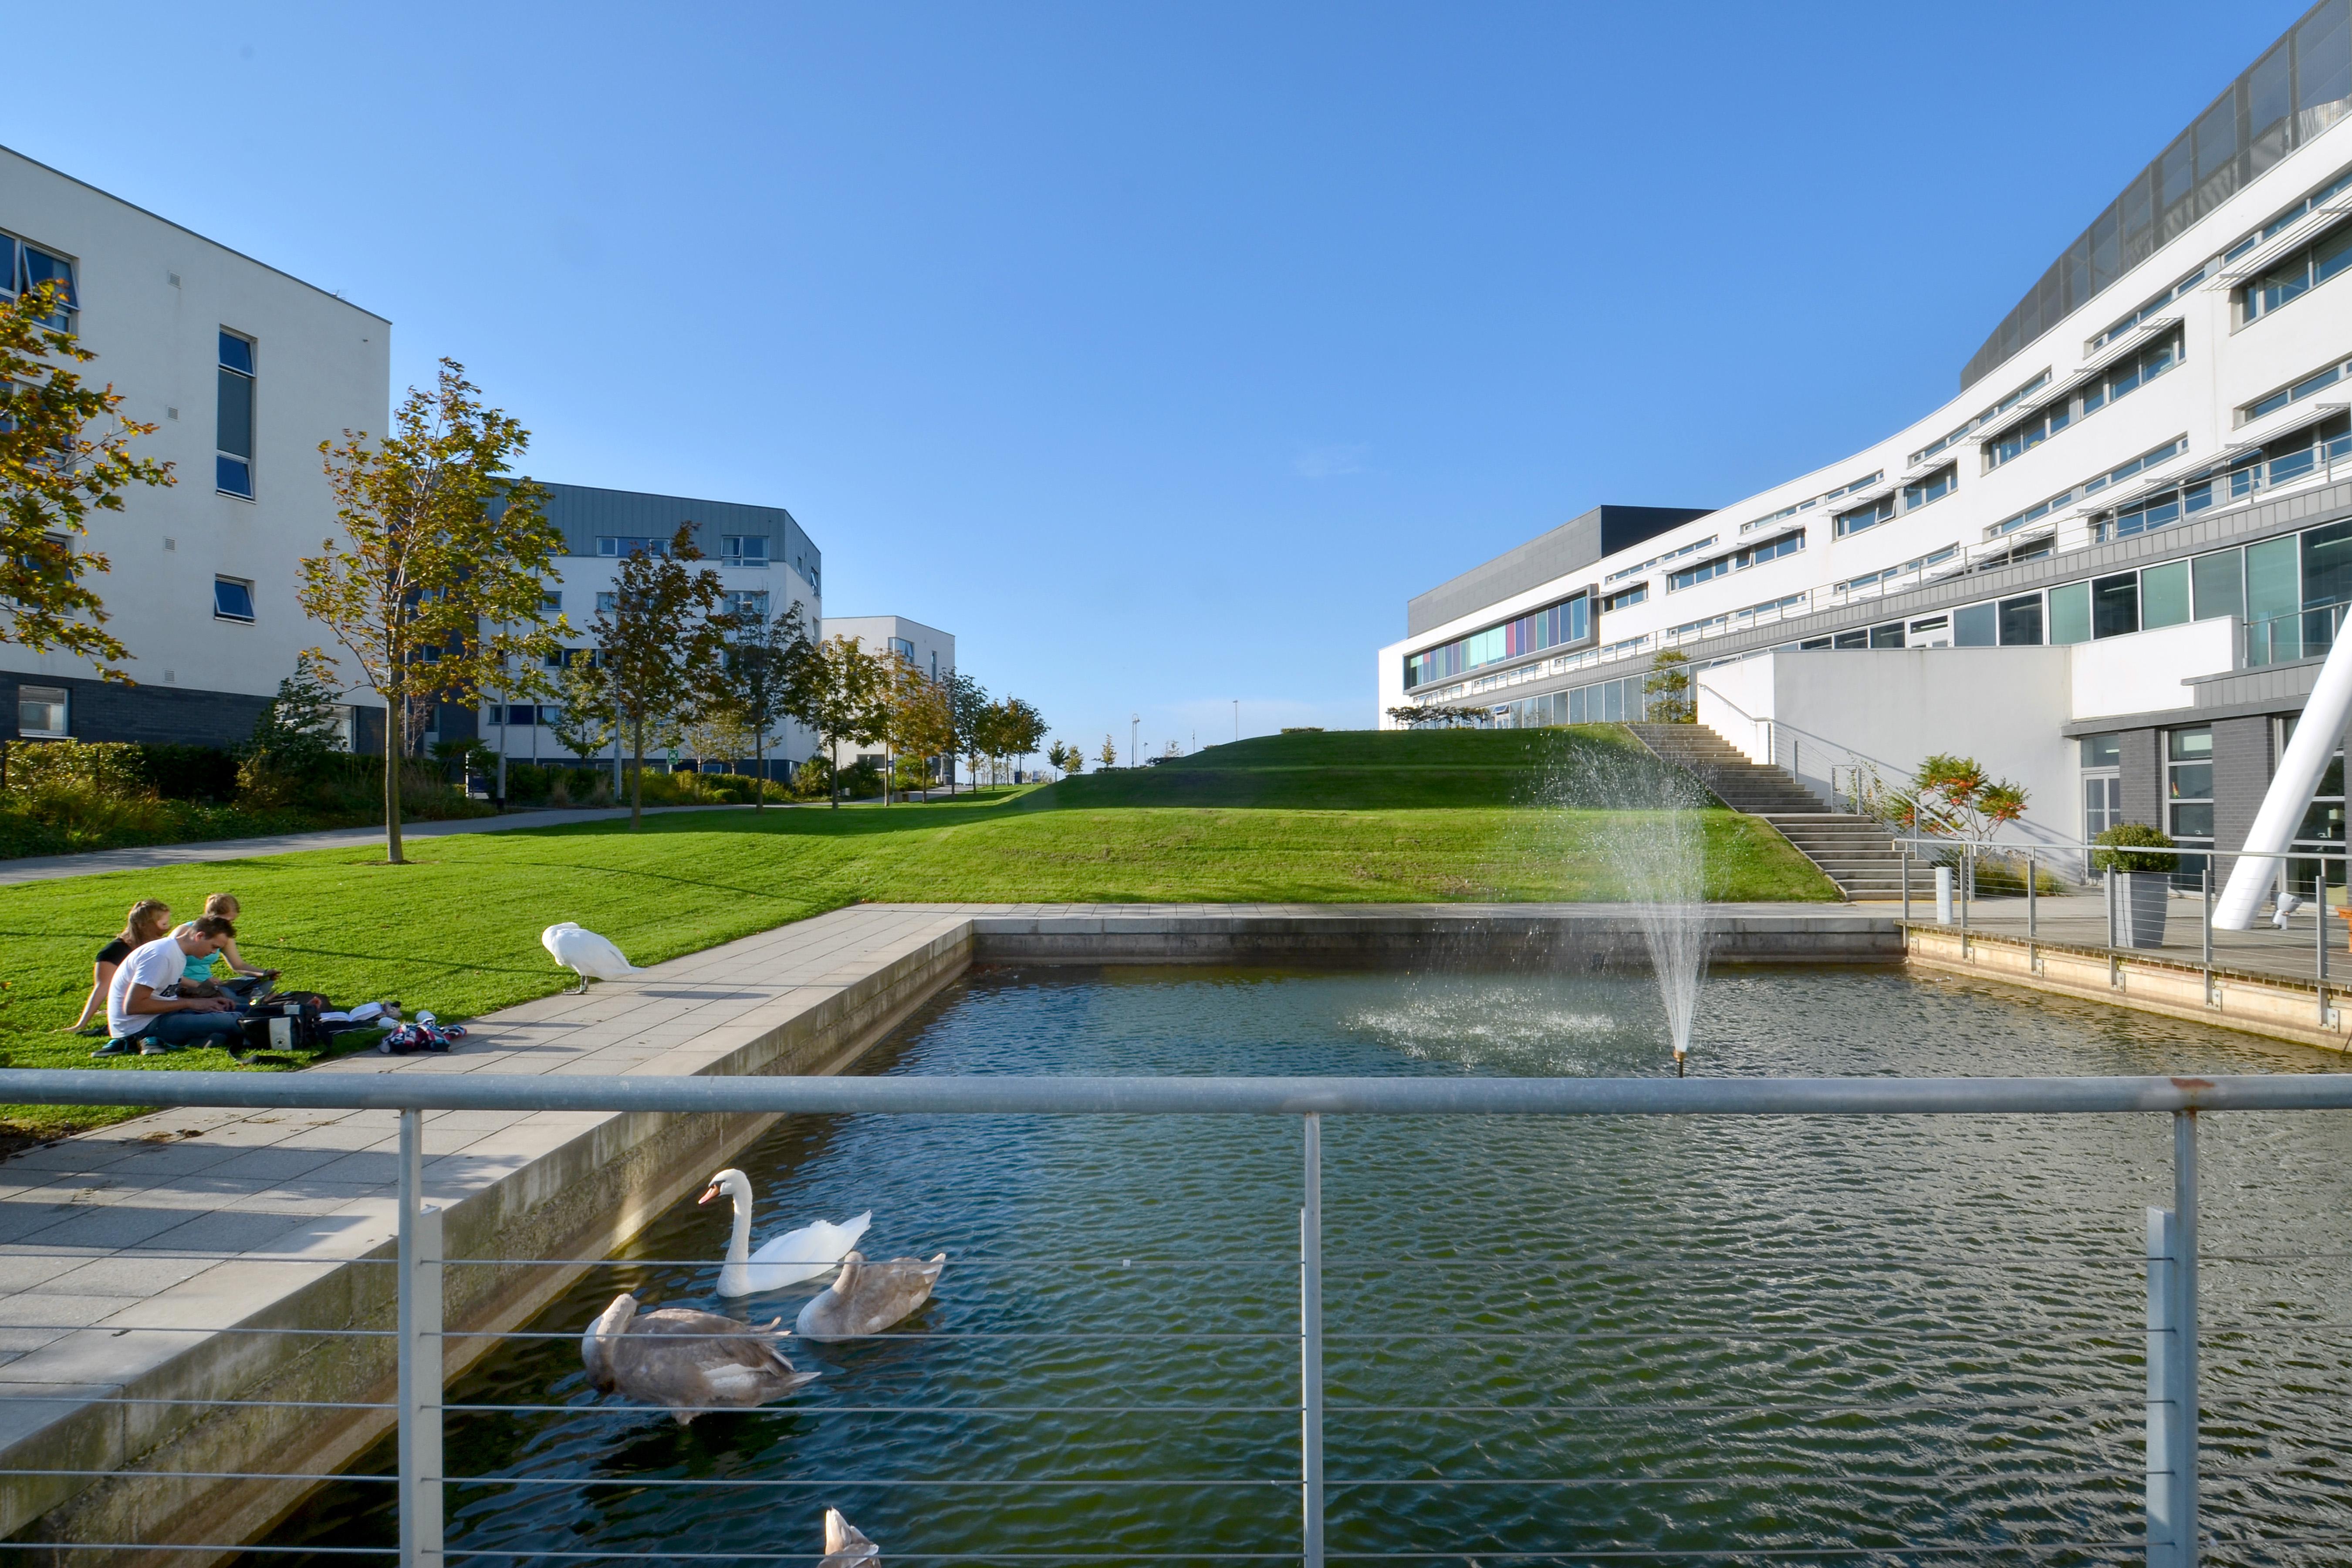 QMU Craighall Campus